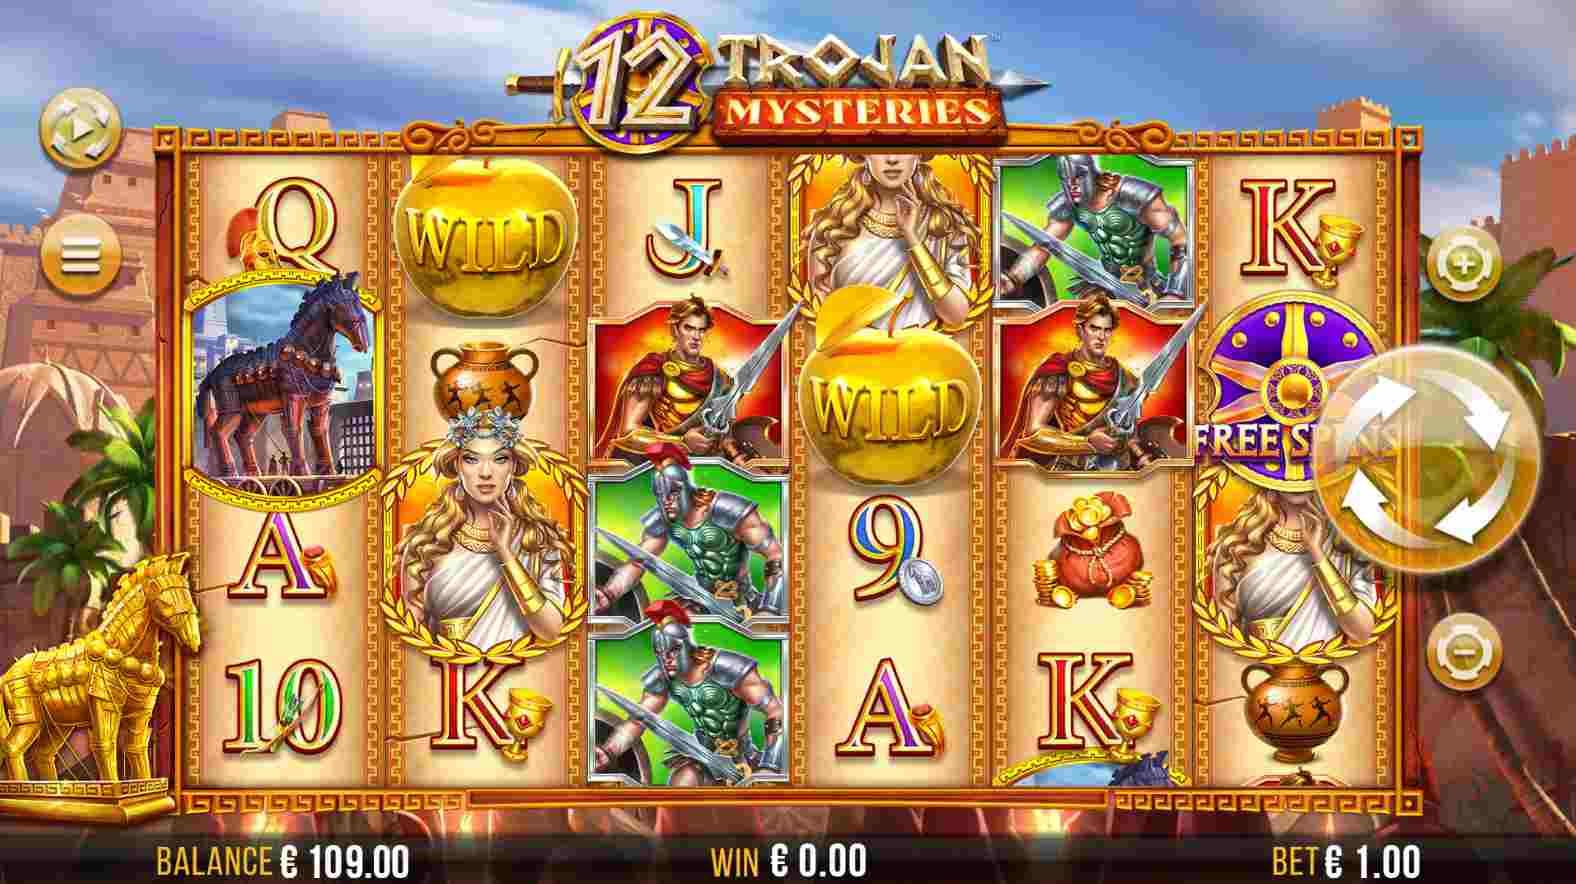 12 Trojan Mysteries Base Game